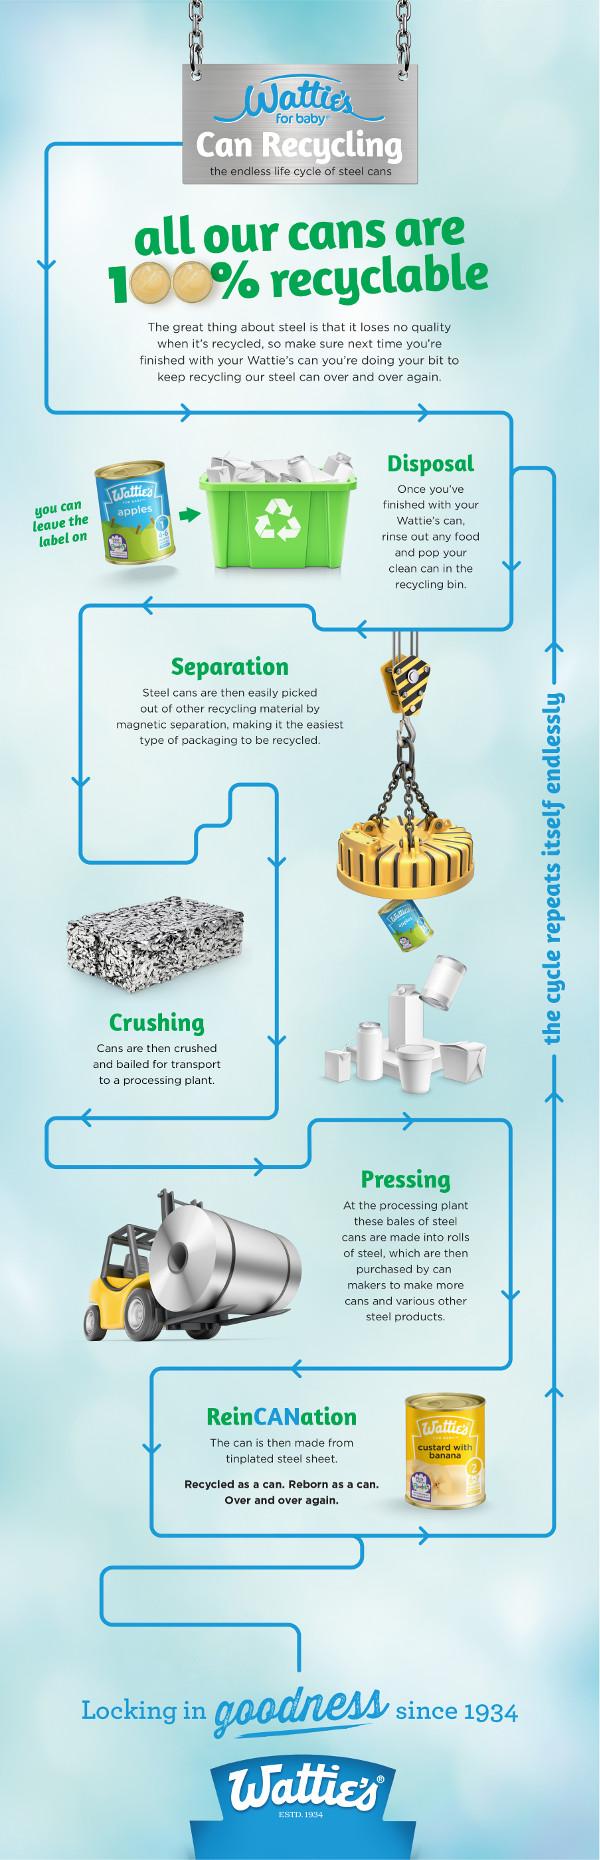 Wattie's Can Recycling Process